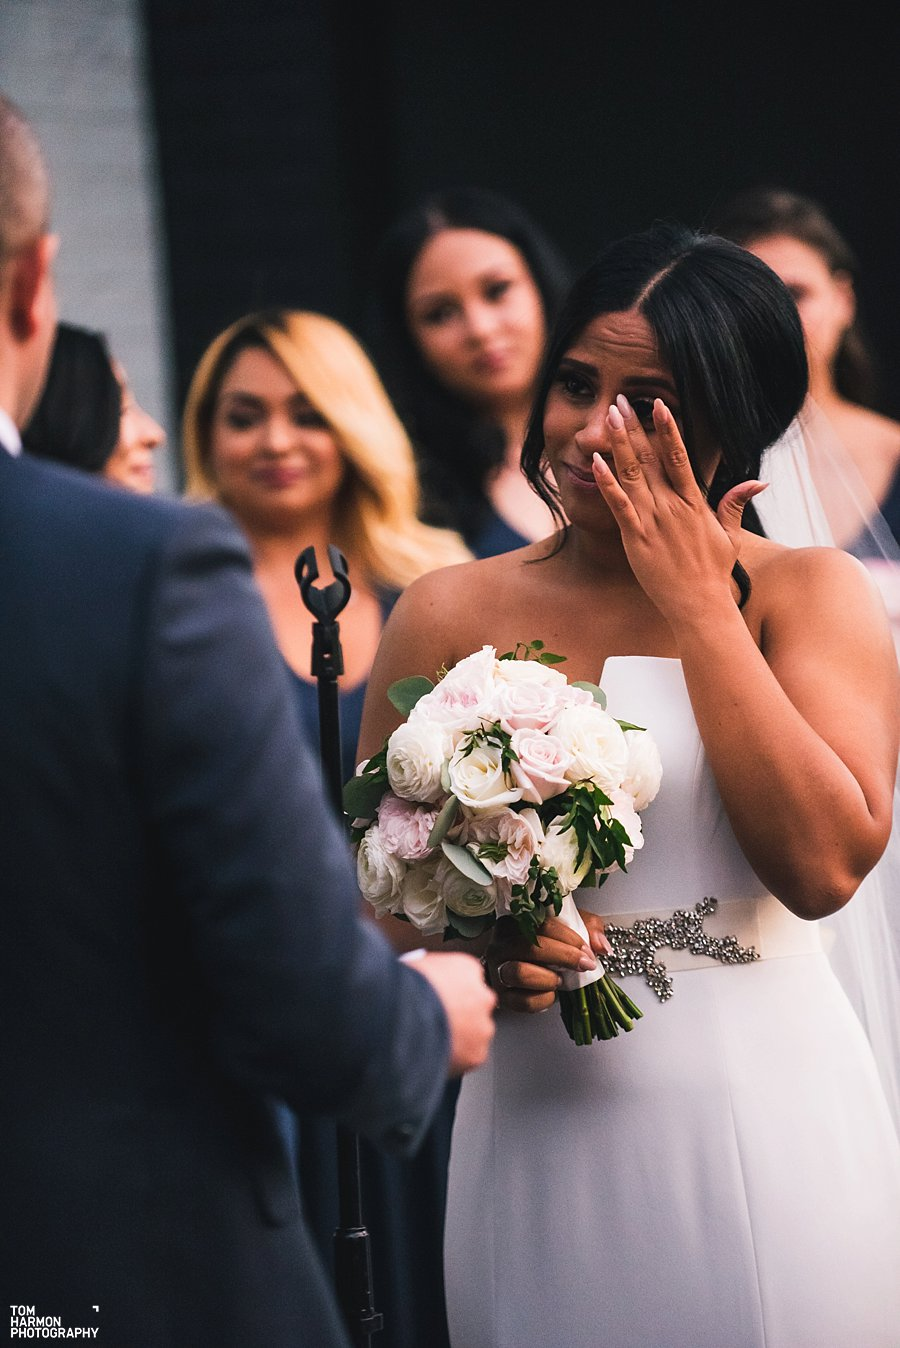 501_union_wedding_0020